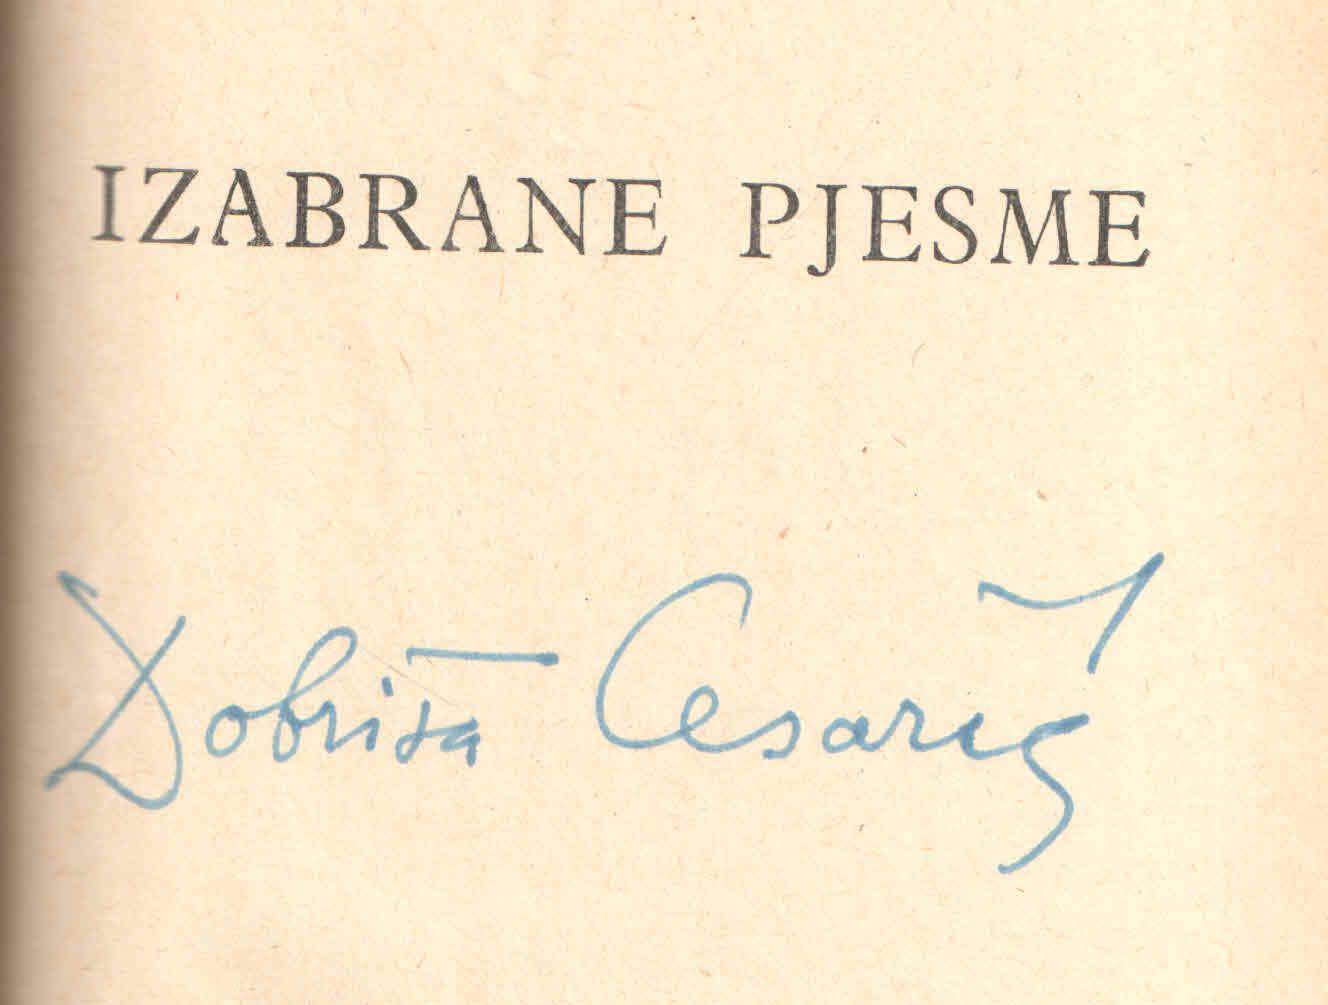 Knjige s potpisom